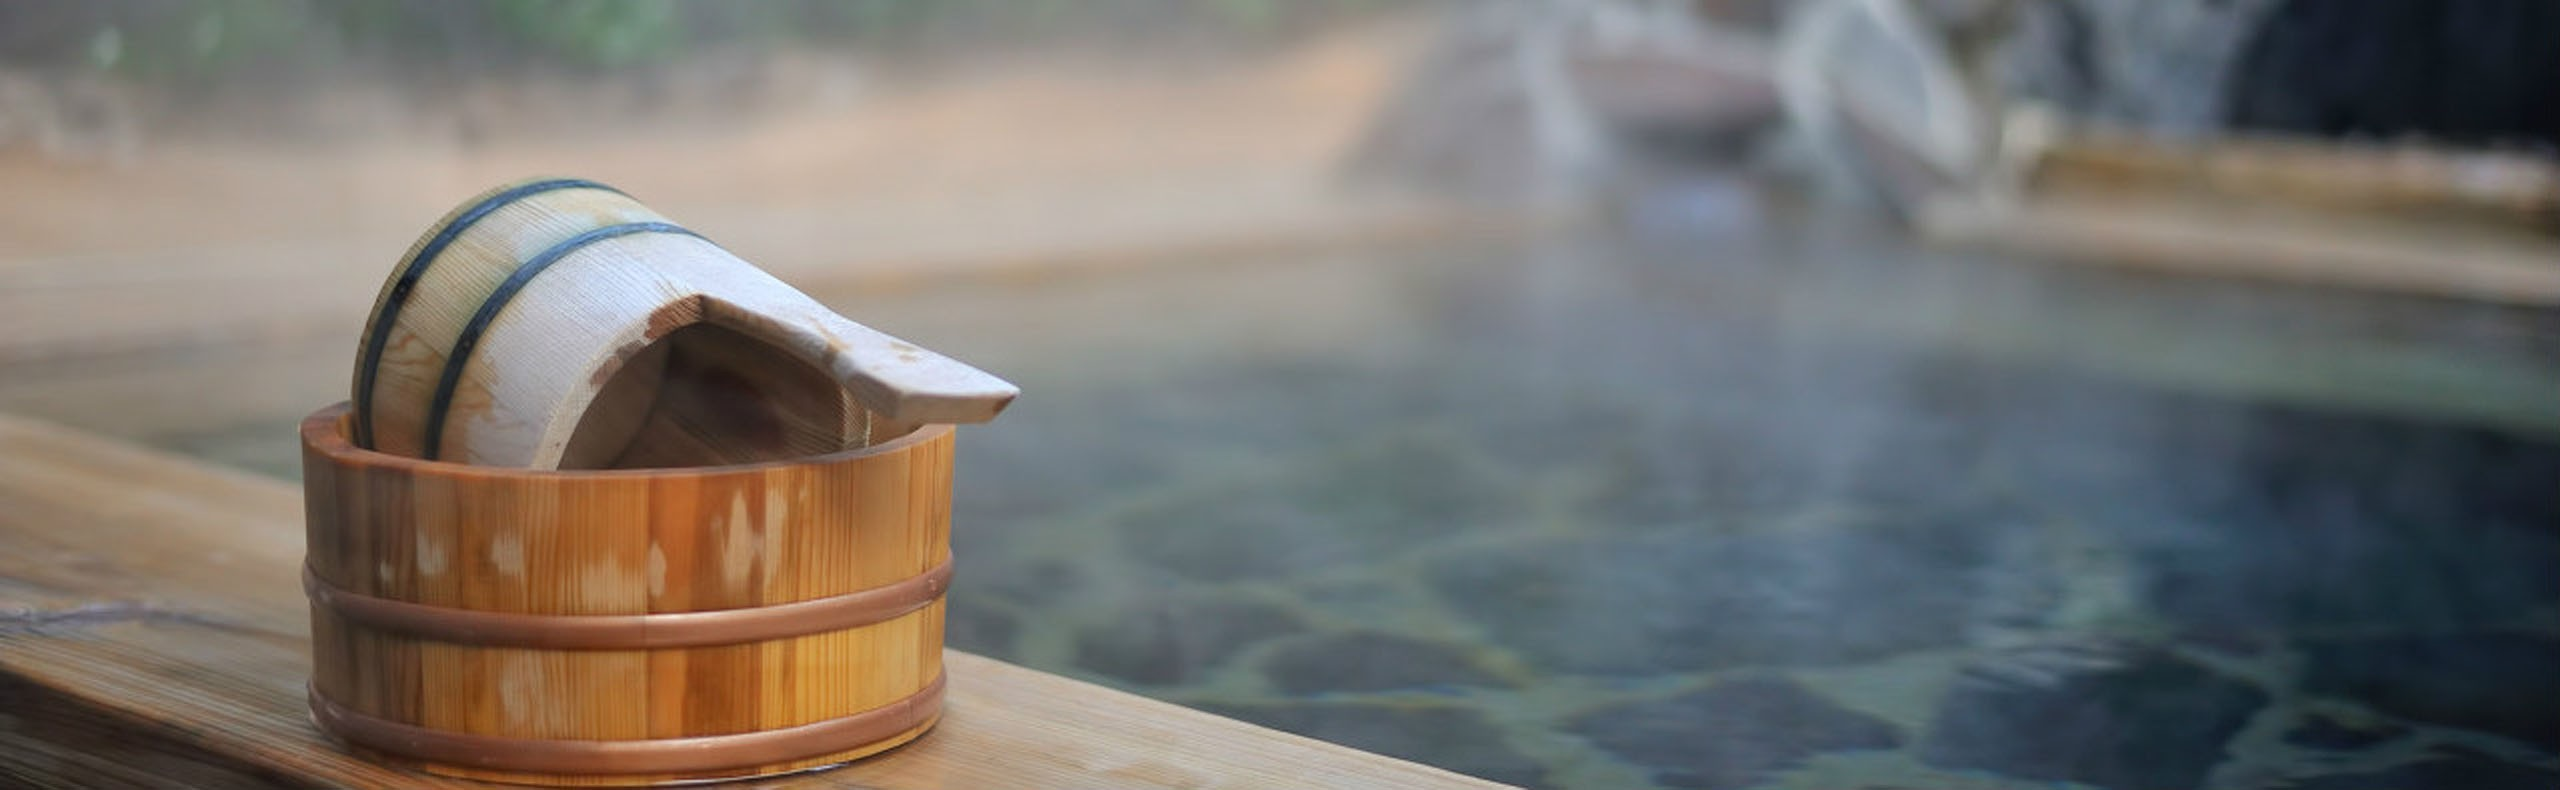 Japanese Hot Springs — Onsens